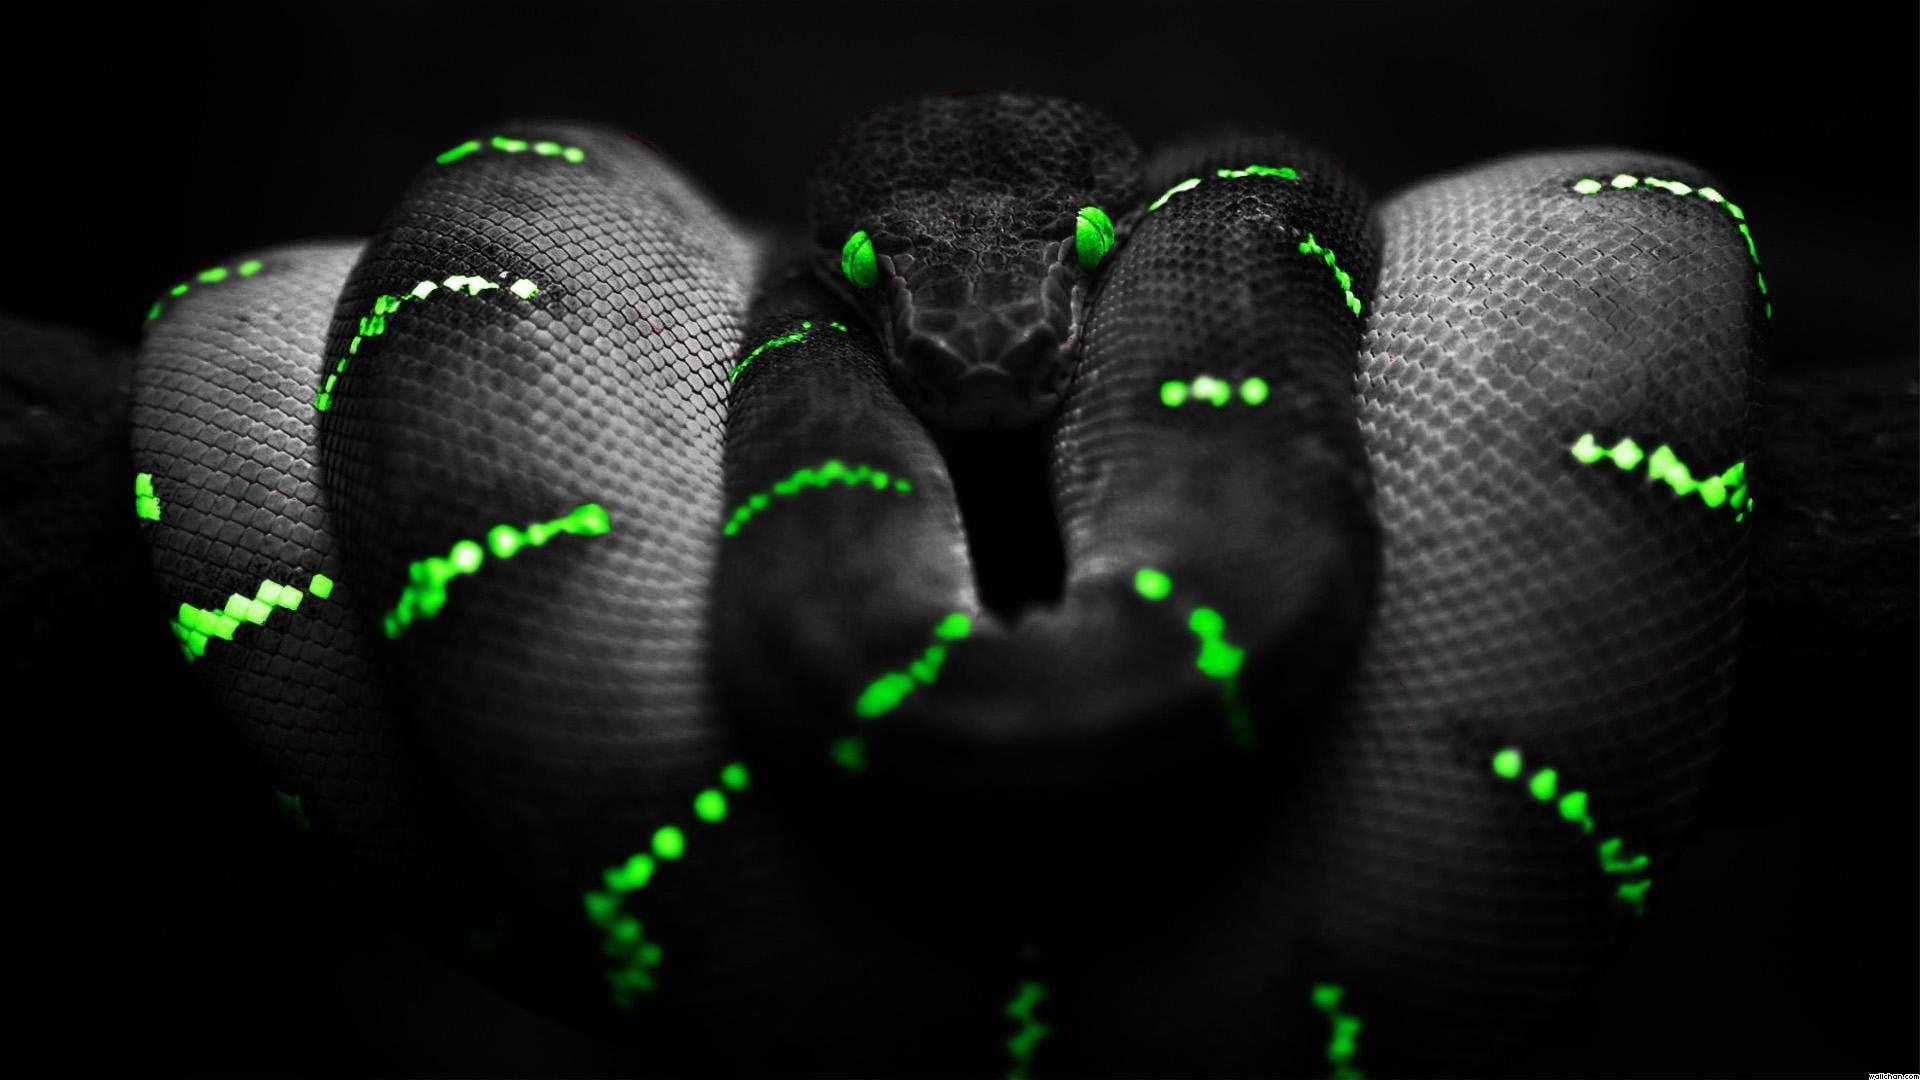 Snake Reptile Digital Art 1920x1080 Snake Ultra Hd 4k 1080p